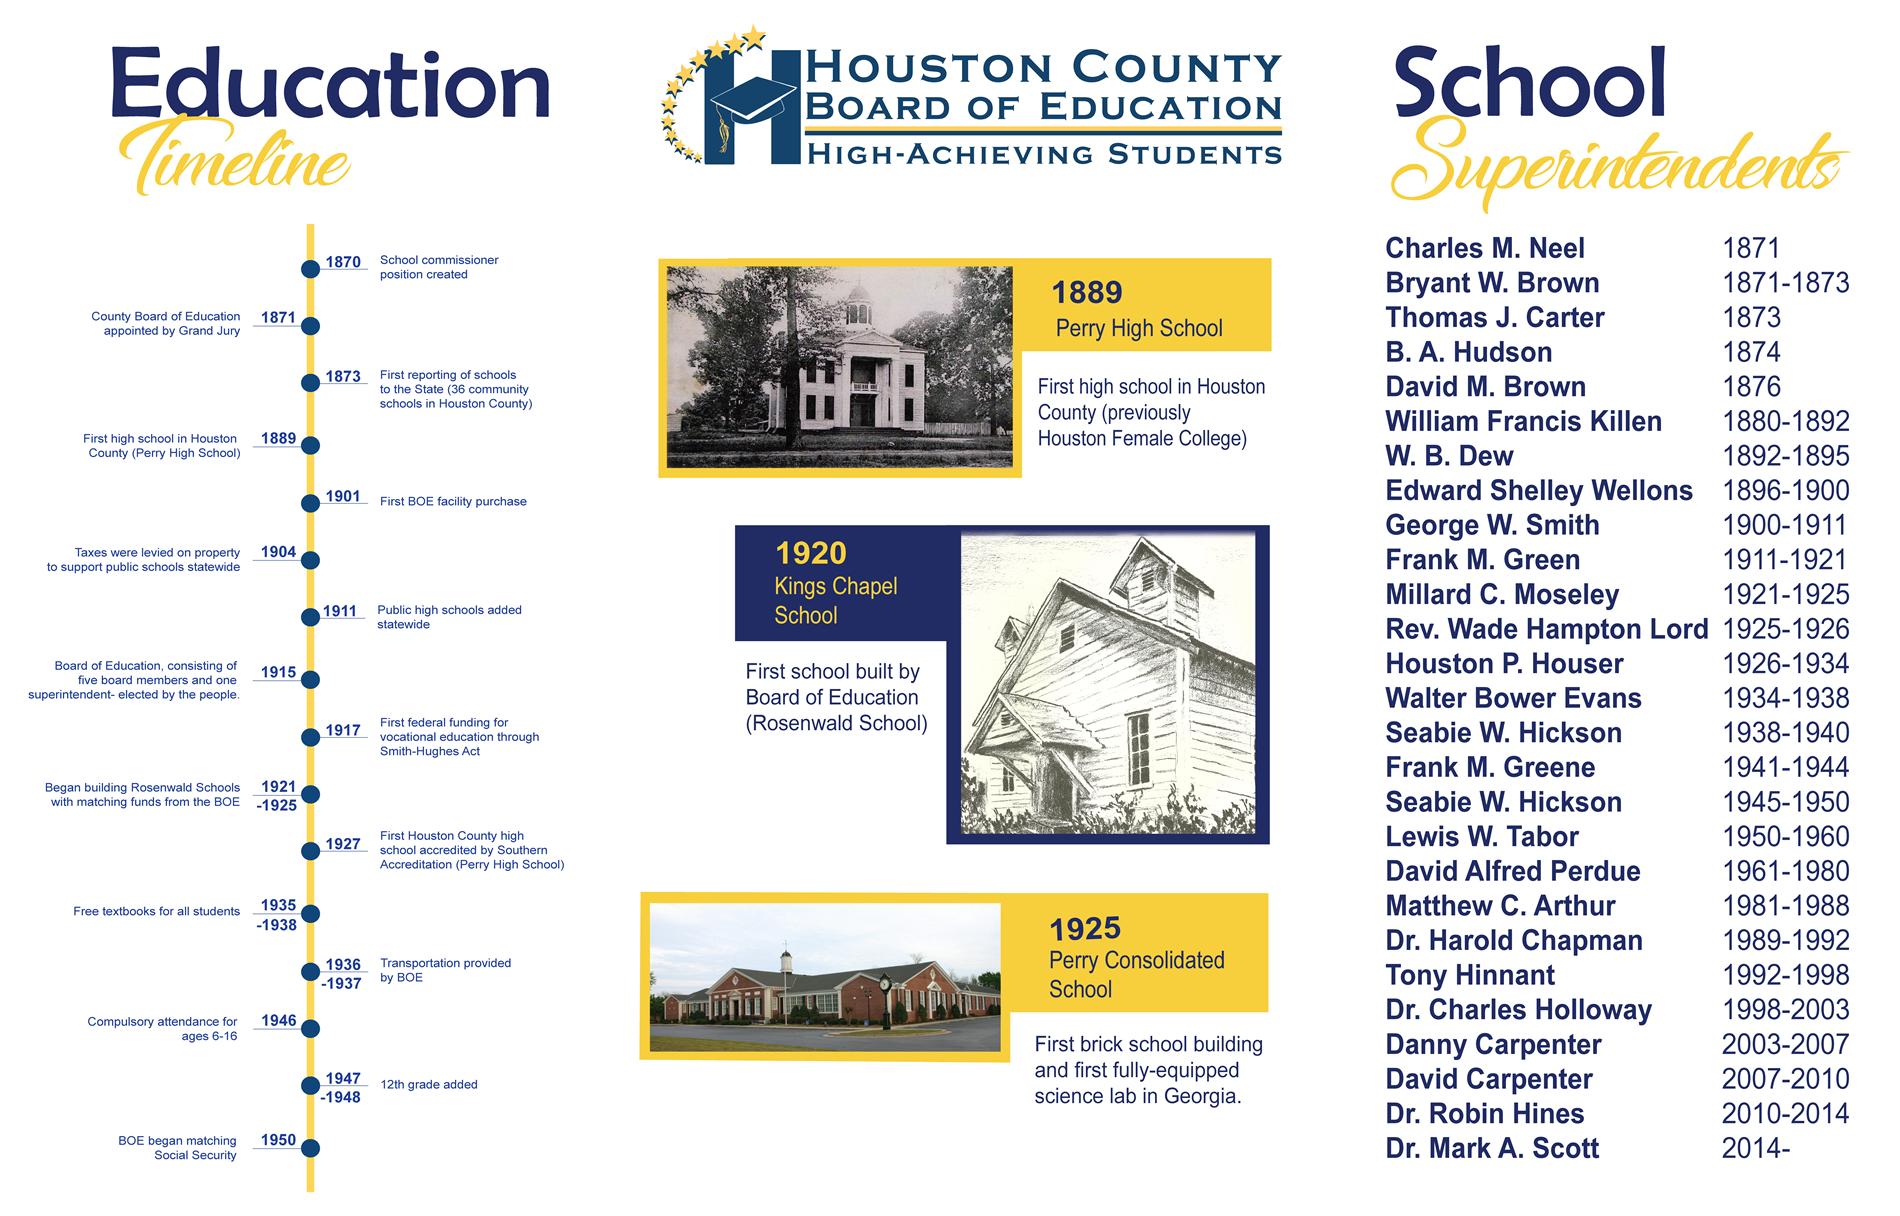 Education Timeline & School Superintendents